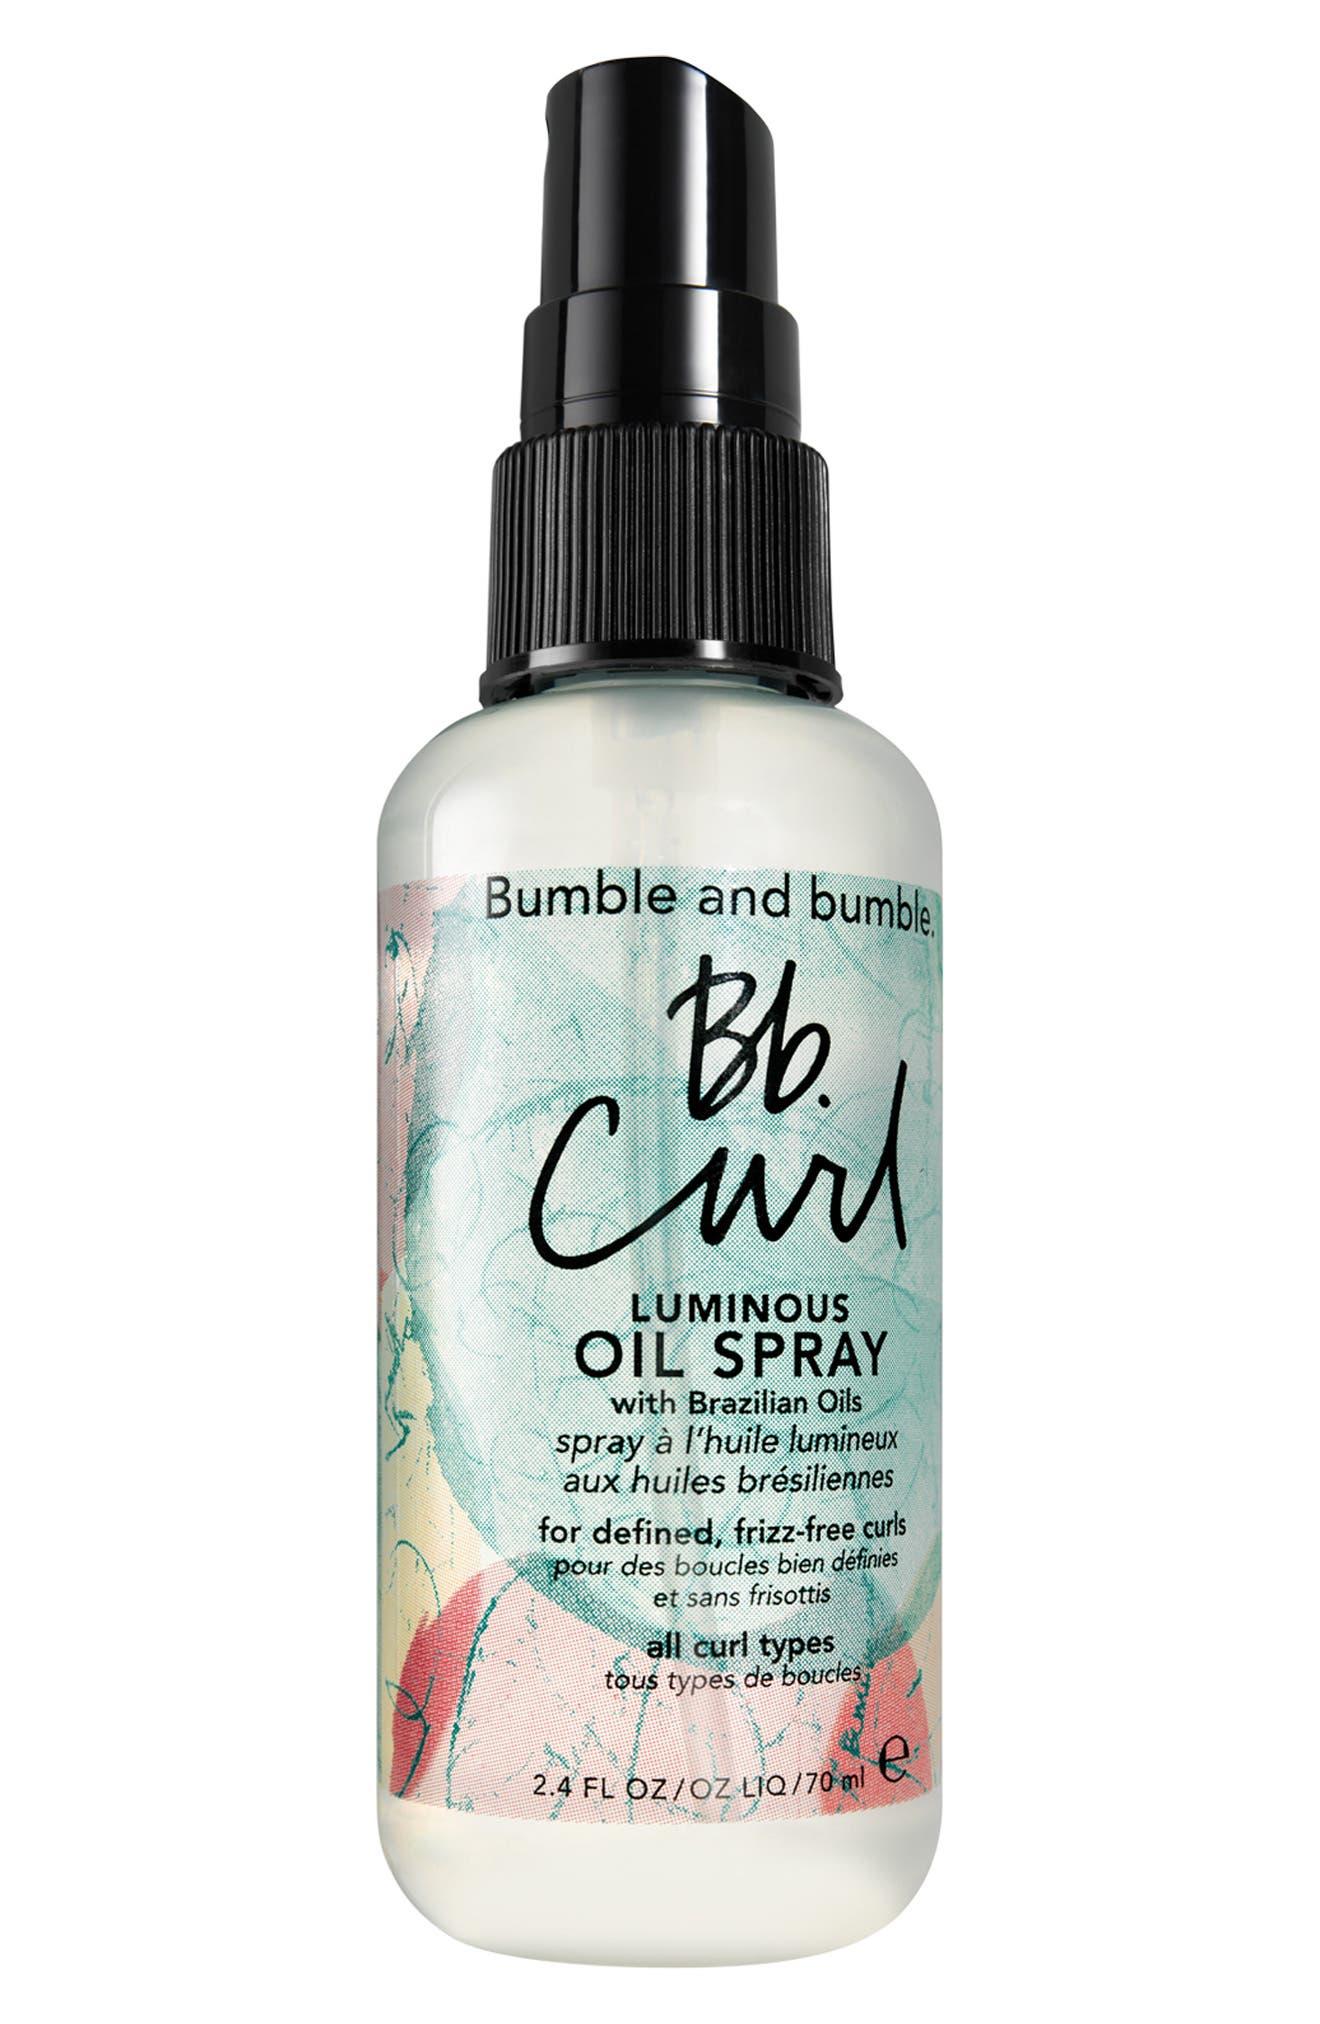 BUMBLE AND BUMBLE., Bumble and bumble Curl Luminous Oil Spray, Main thumbnail 1, color, NO COLOR